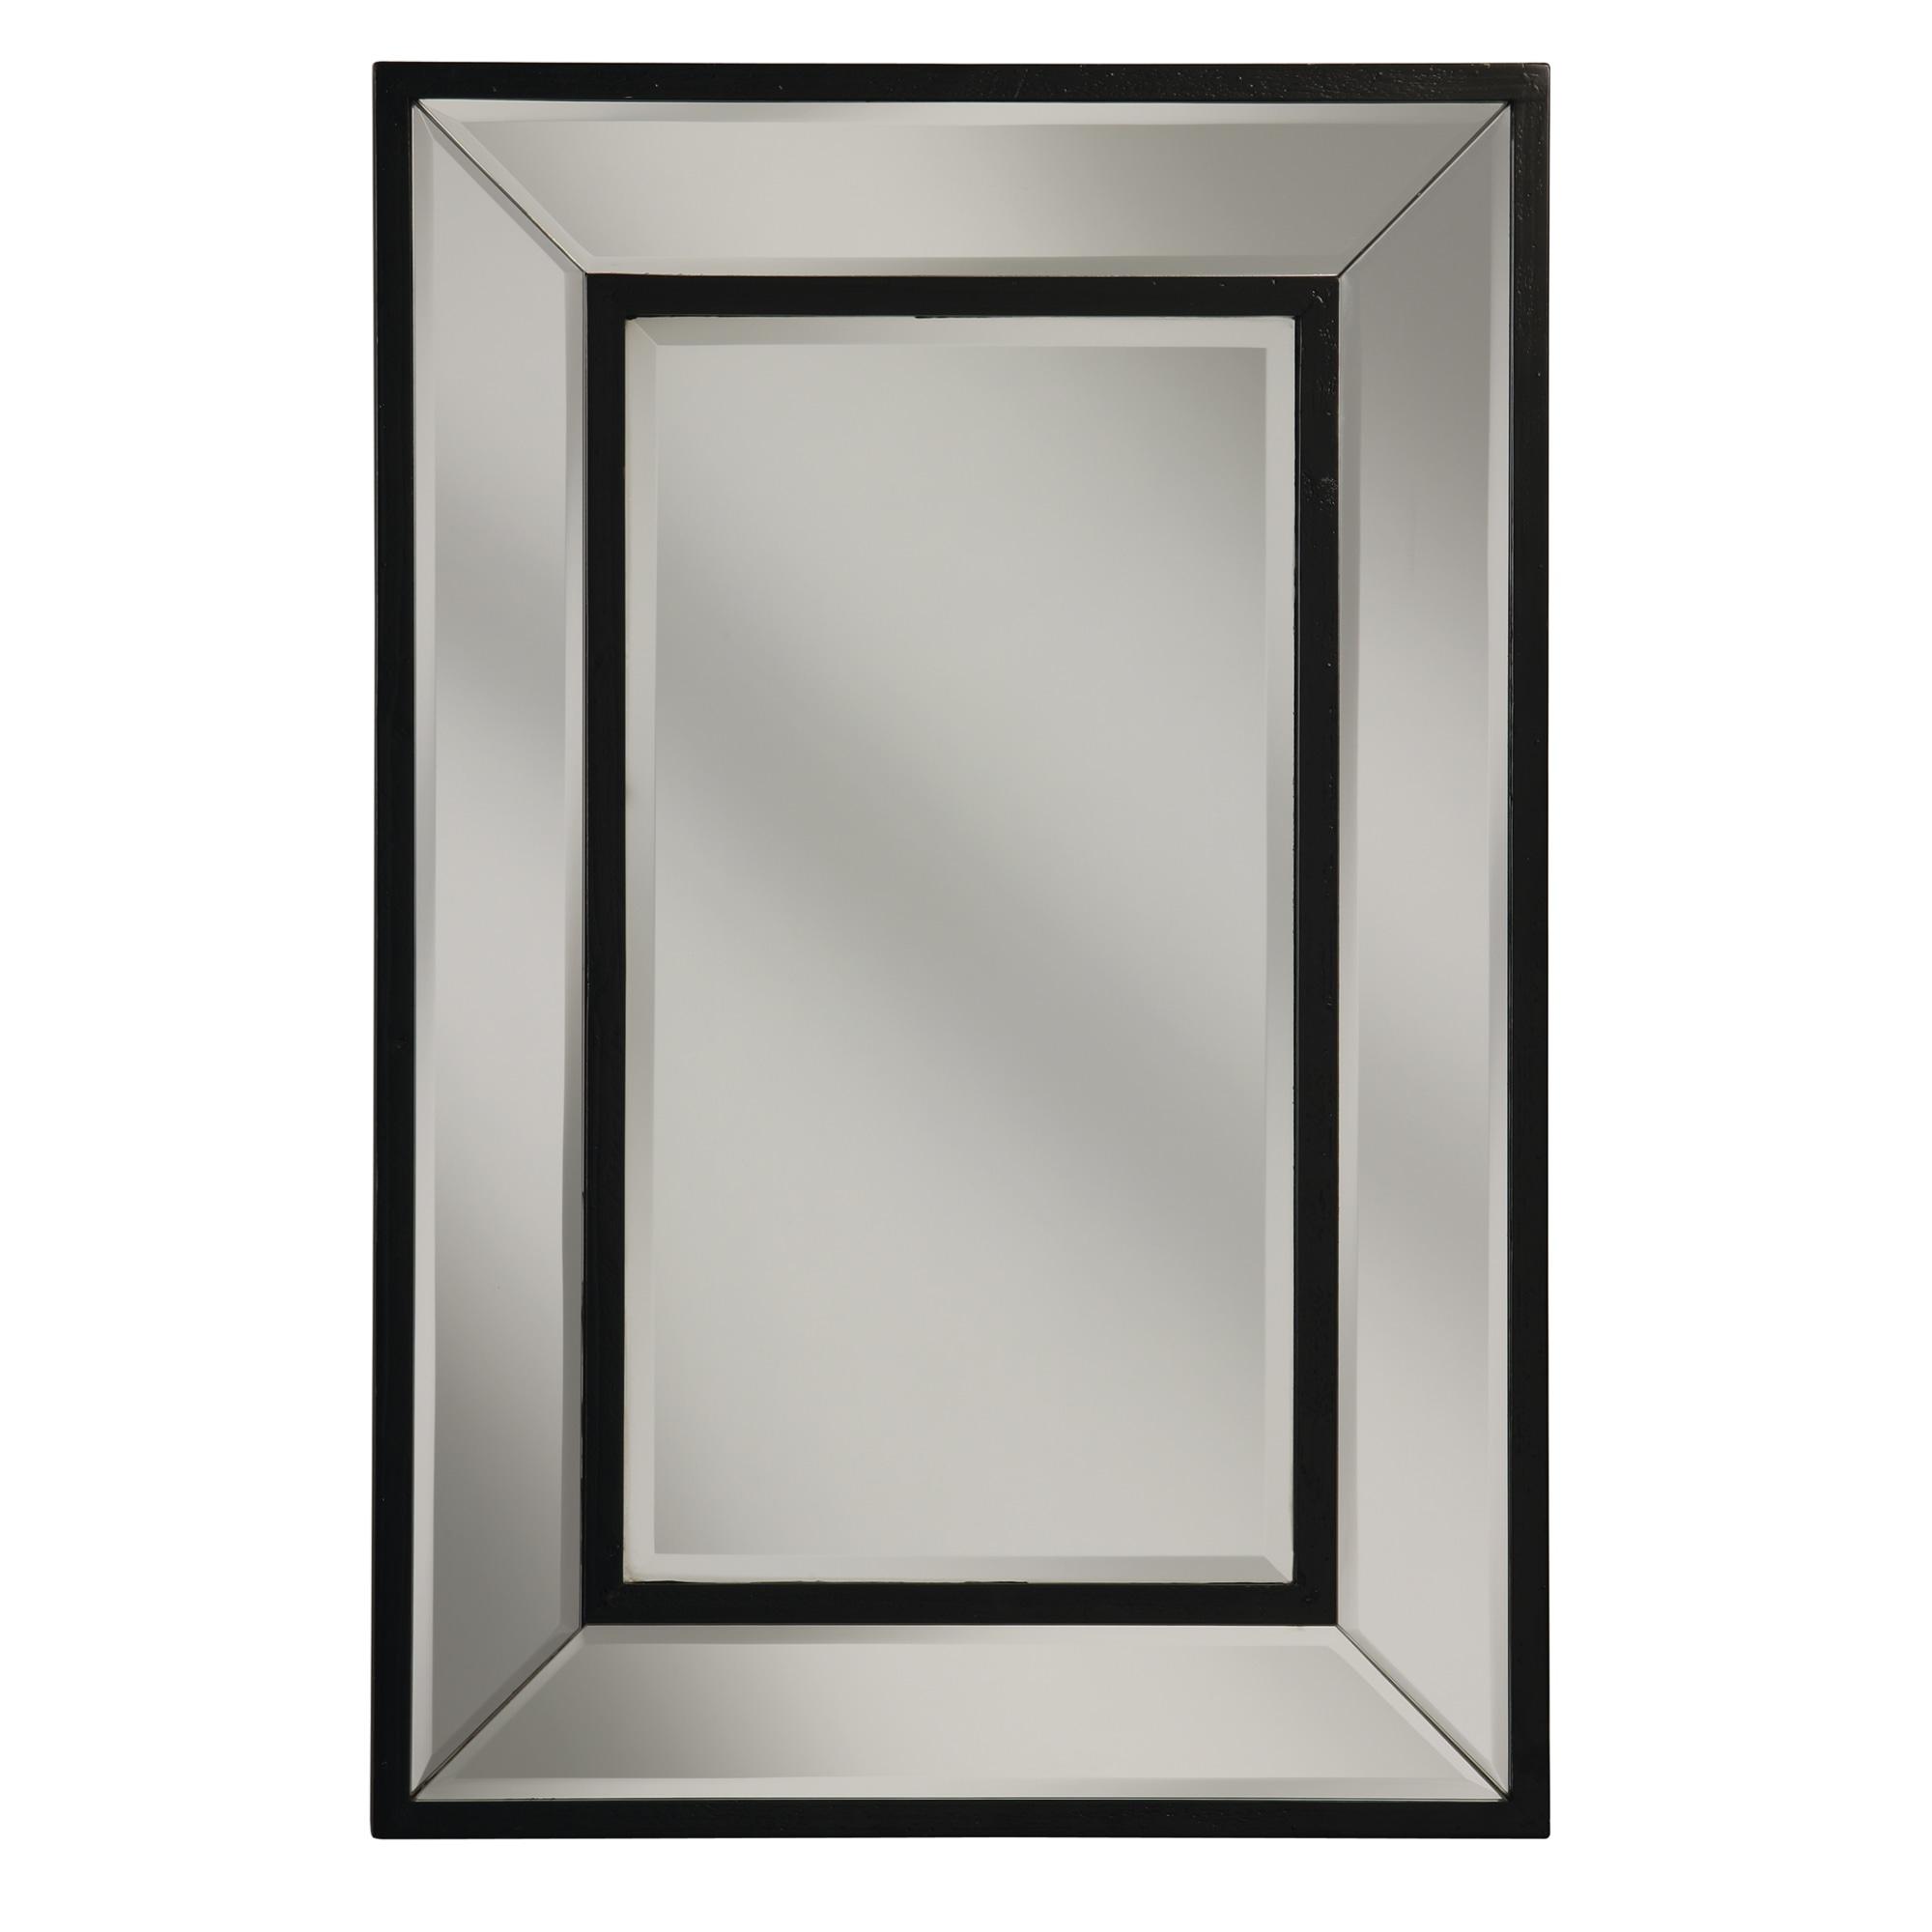 Image for 656-003 Highland Park Mirror from Howard Miller Official Website